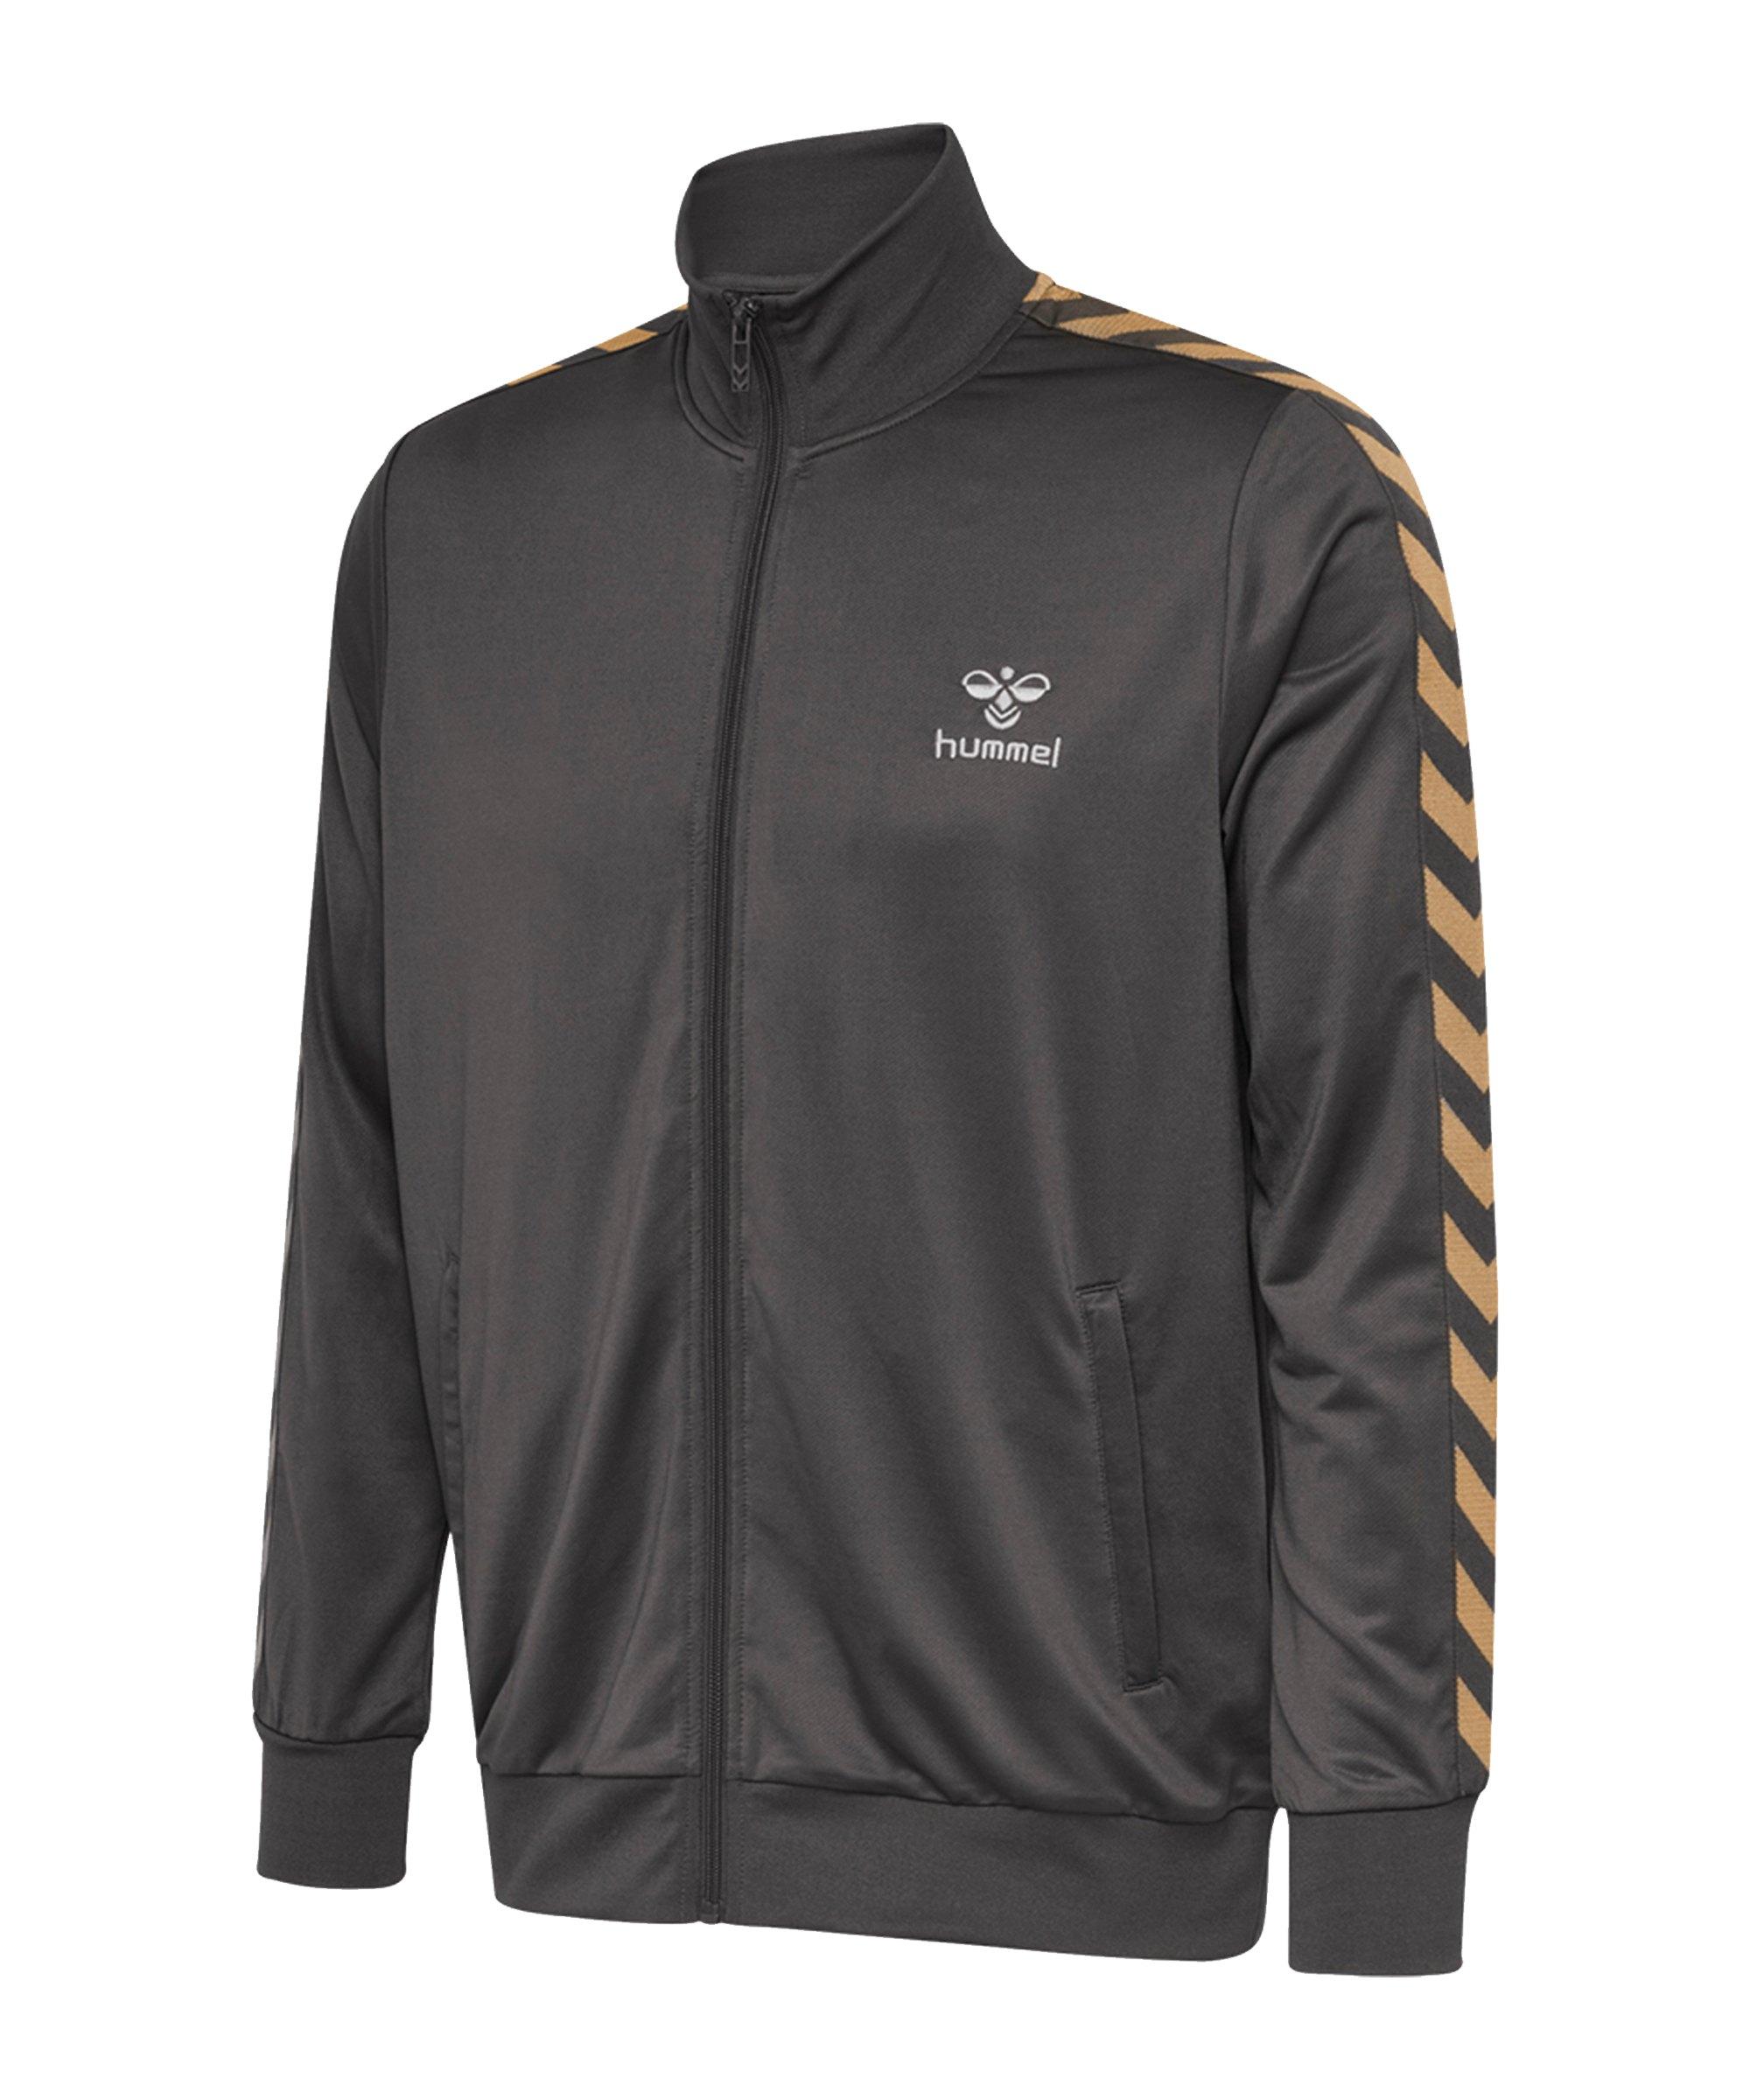 Hummel Nathan Zip Trainingsjacke Grau F1025 - grau